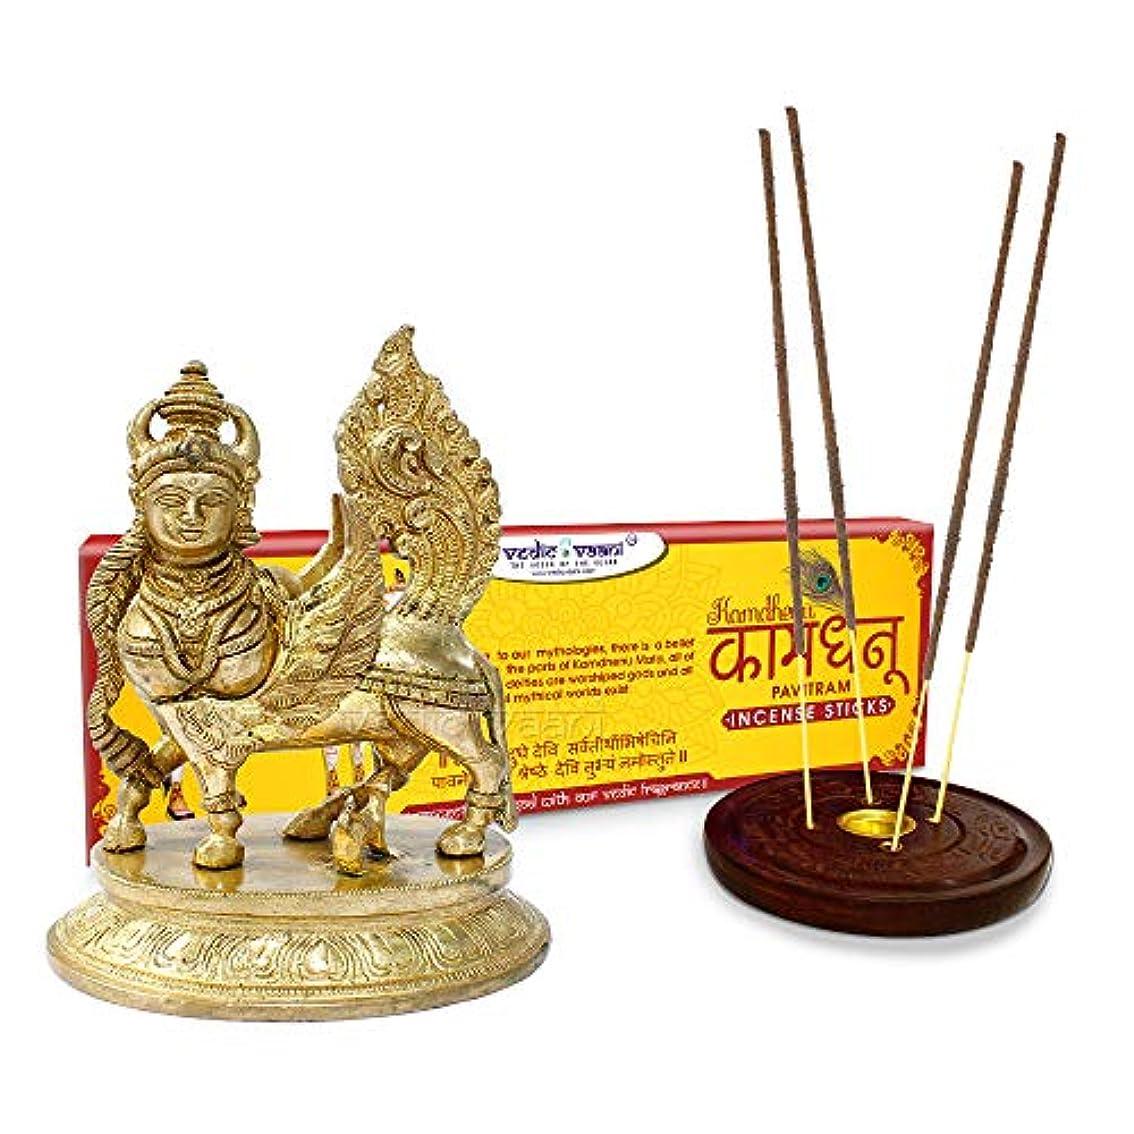 区別実験室仲介者Vedic Vaani Kamdhenu Idol 真鍮製 Kamdhenu お香スティック